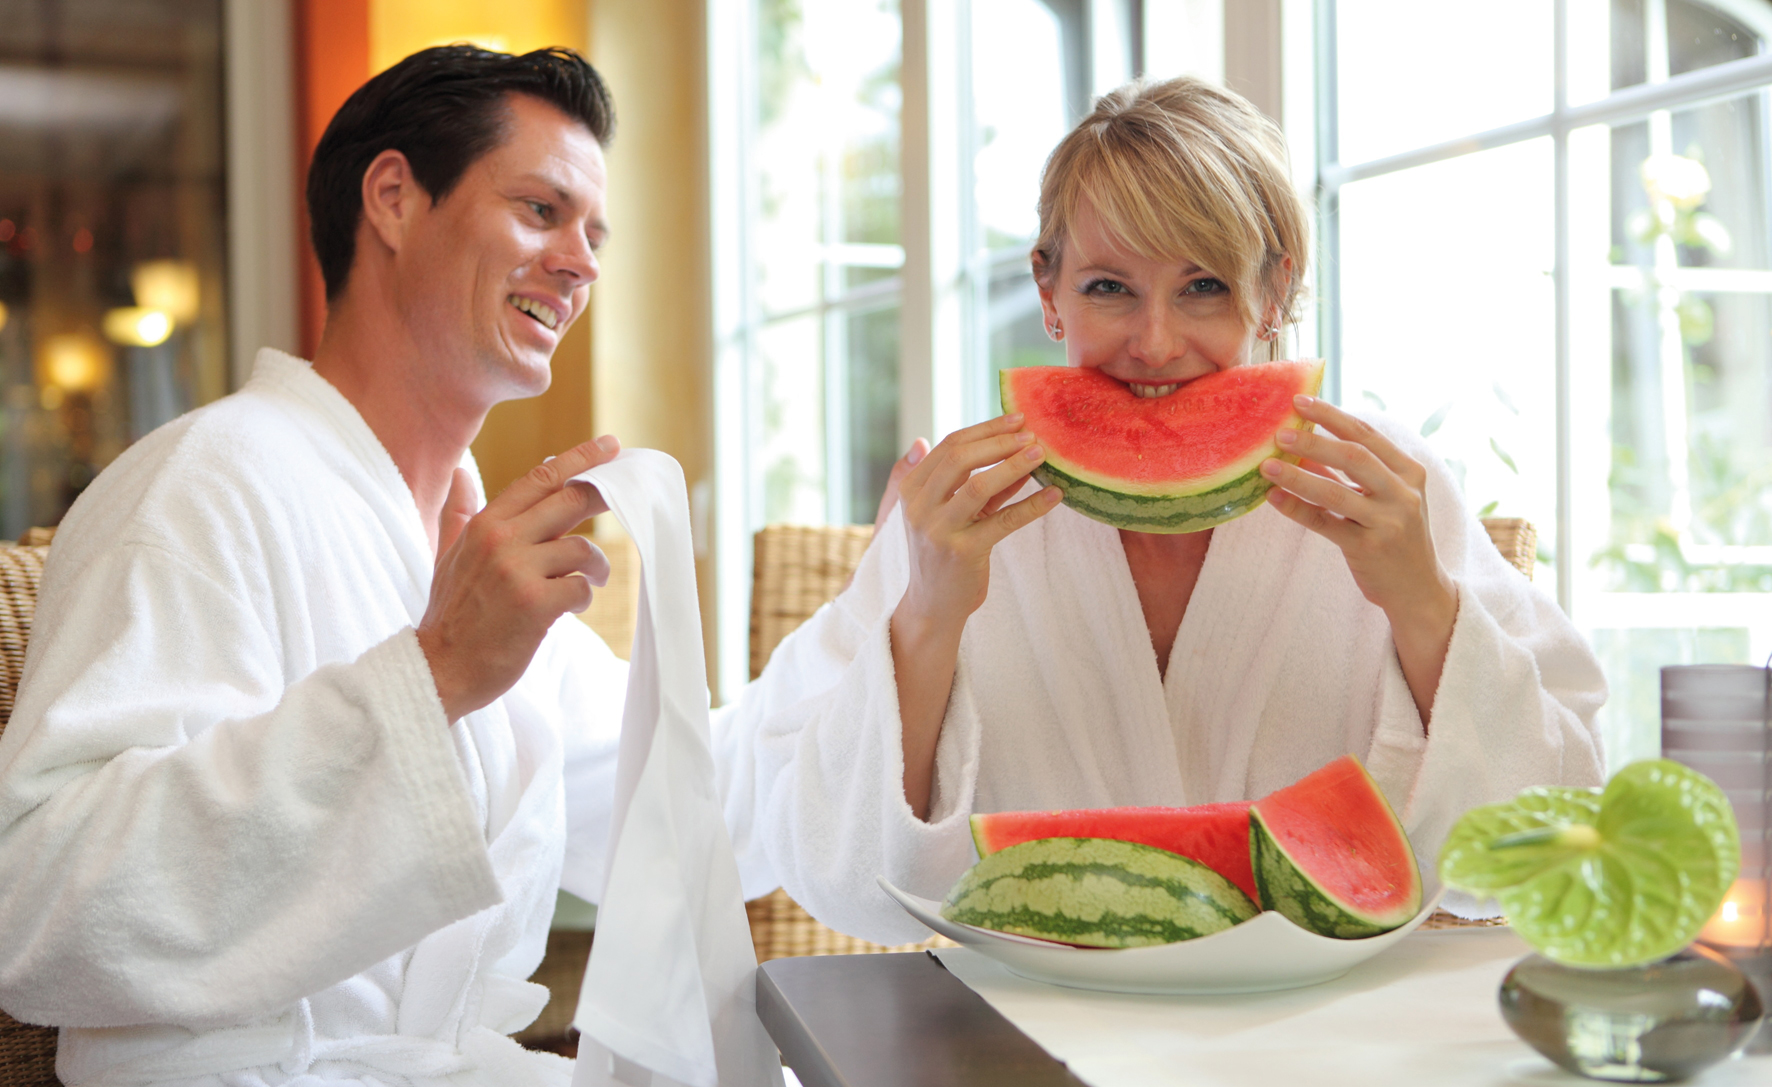 Wellnesstipps Rezepte Massage Früchte